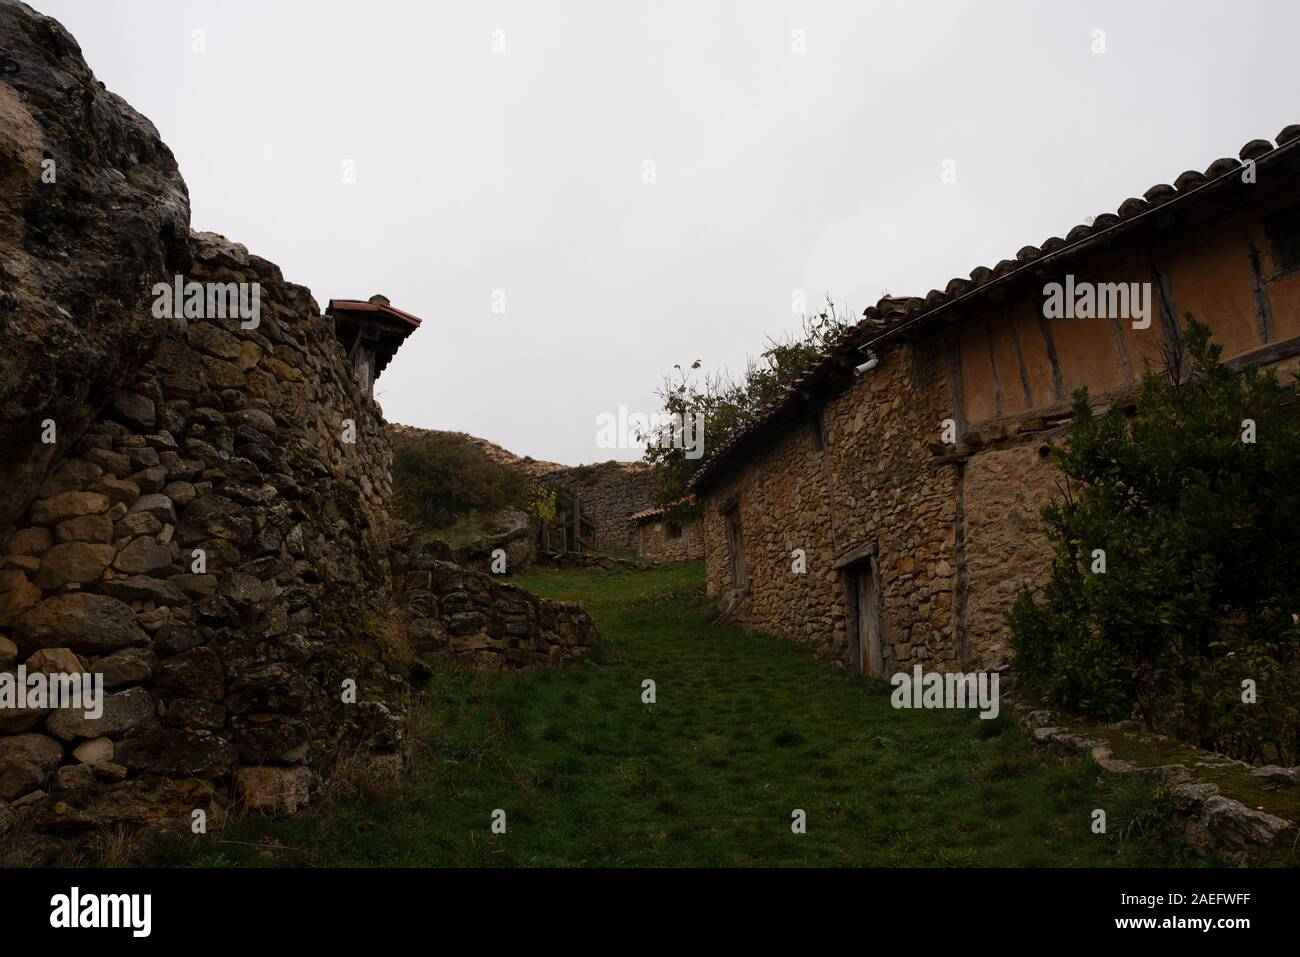 The medieval village of Calatanazor in Soria, Spain Stock Photo